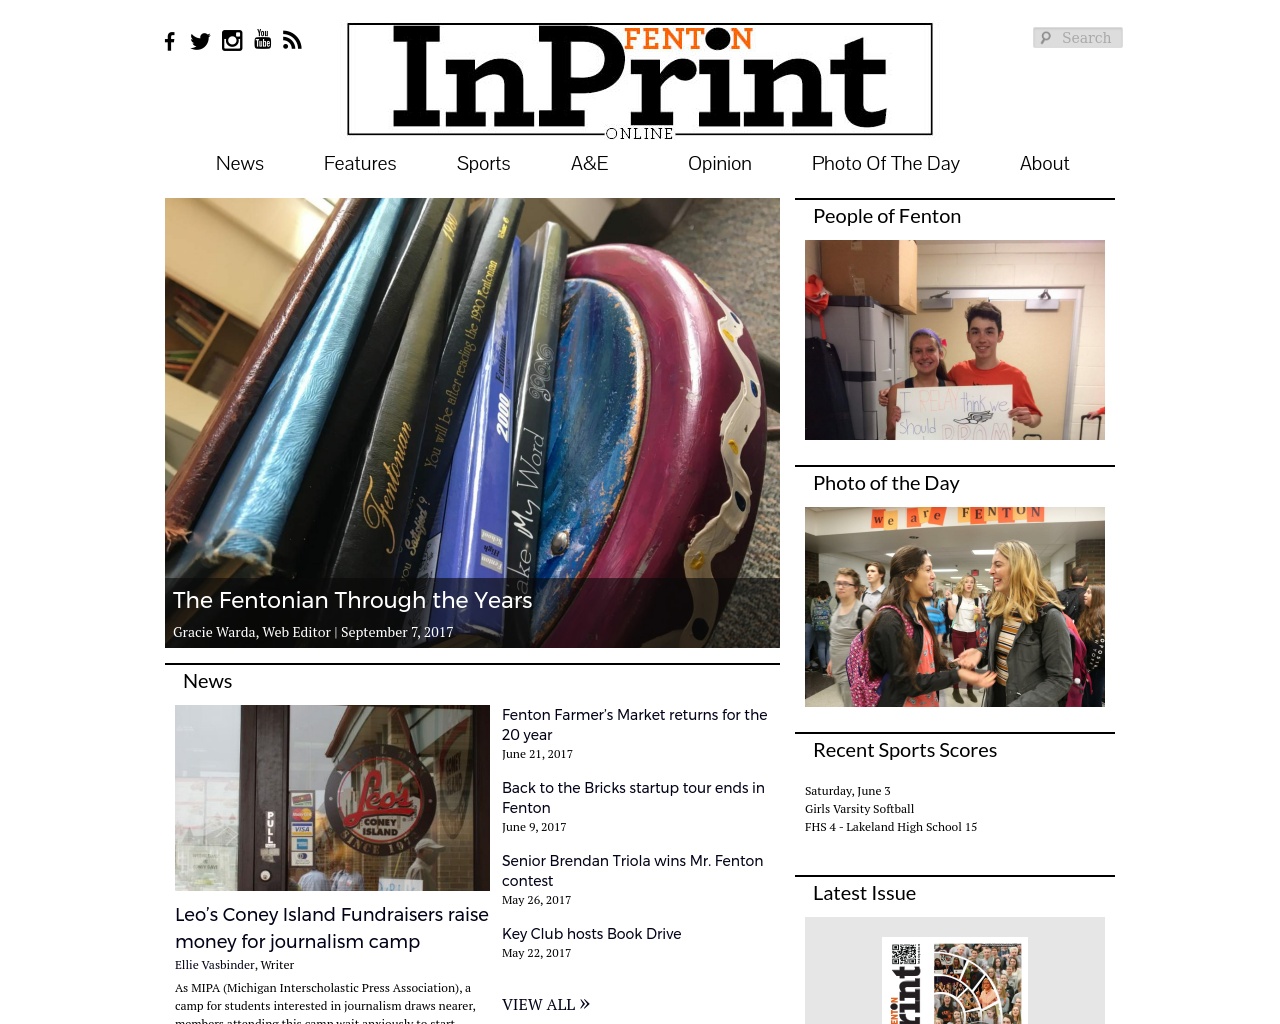 Fenton-InPrint-Advertising-Reviews-Pricing